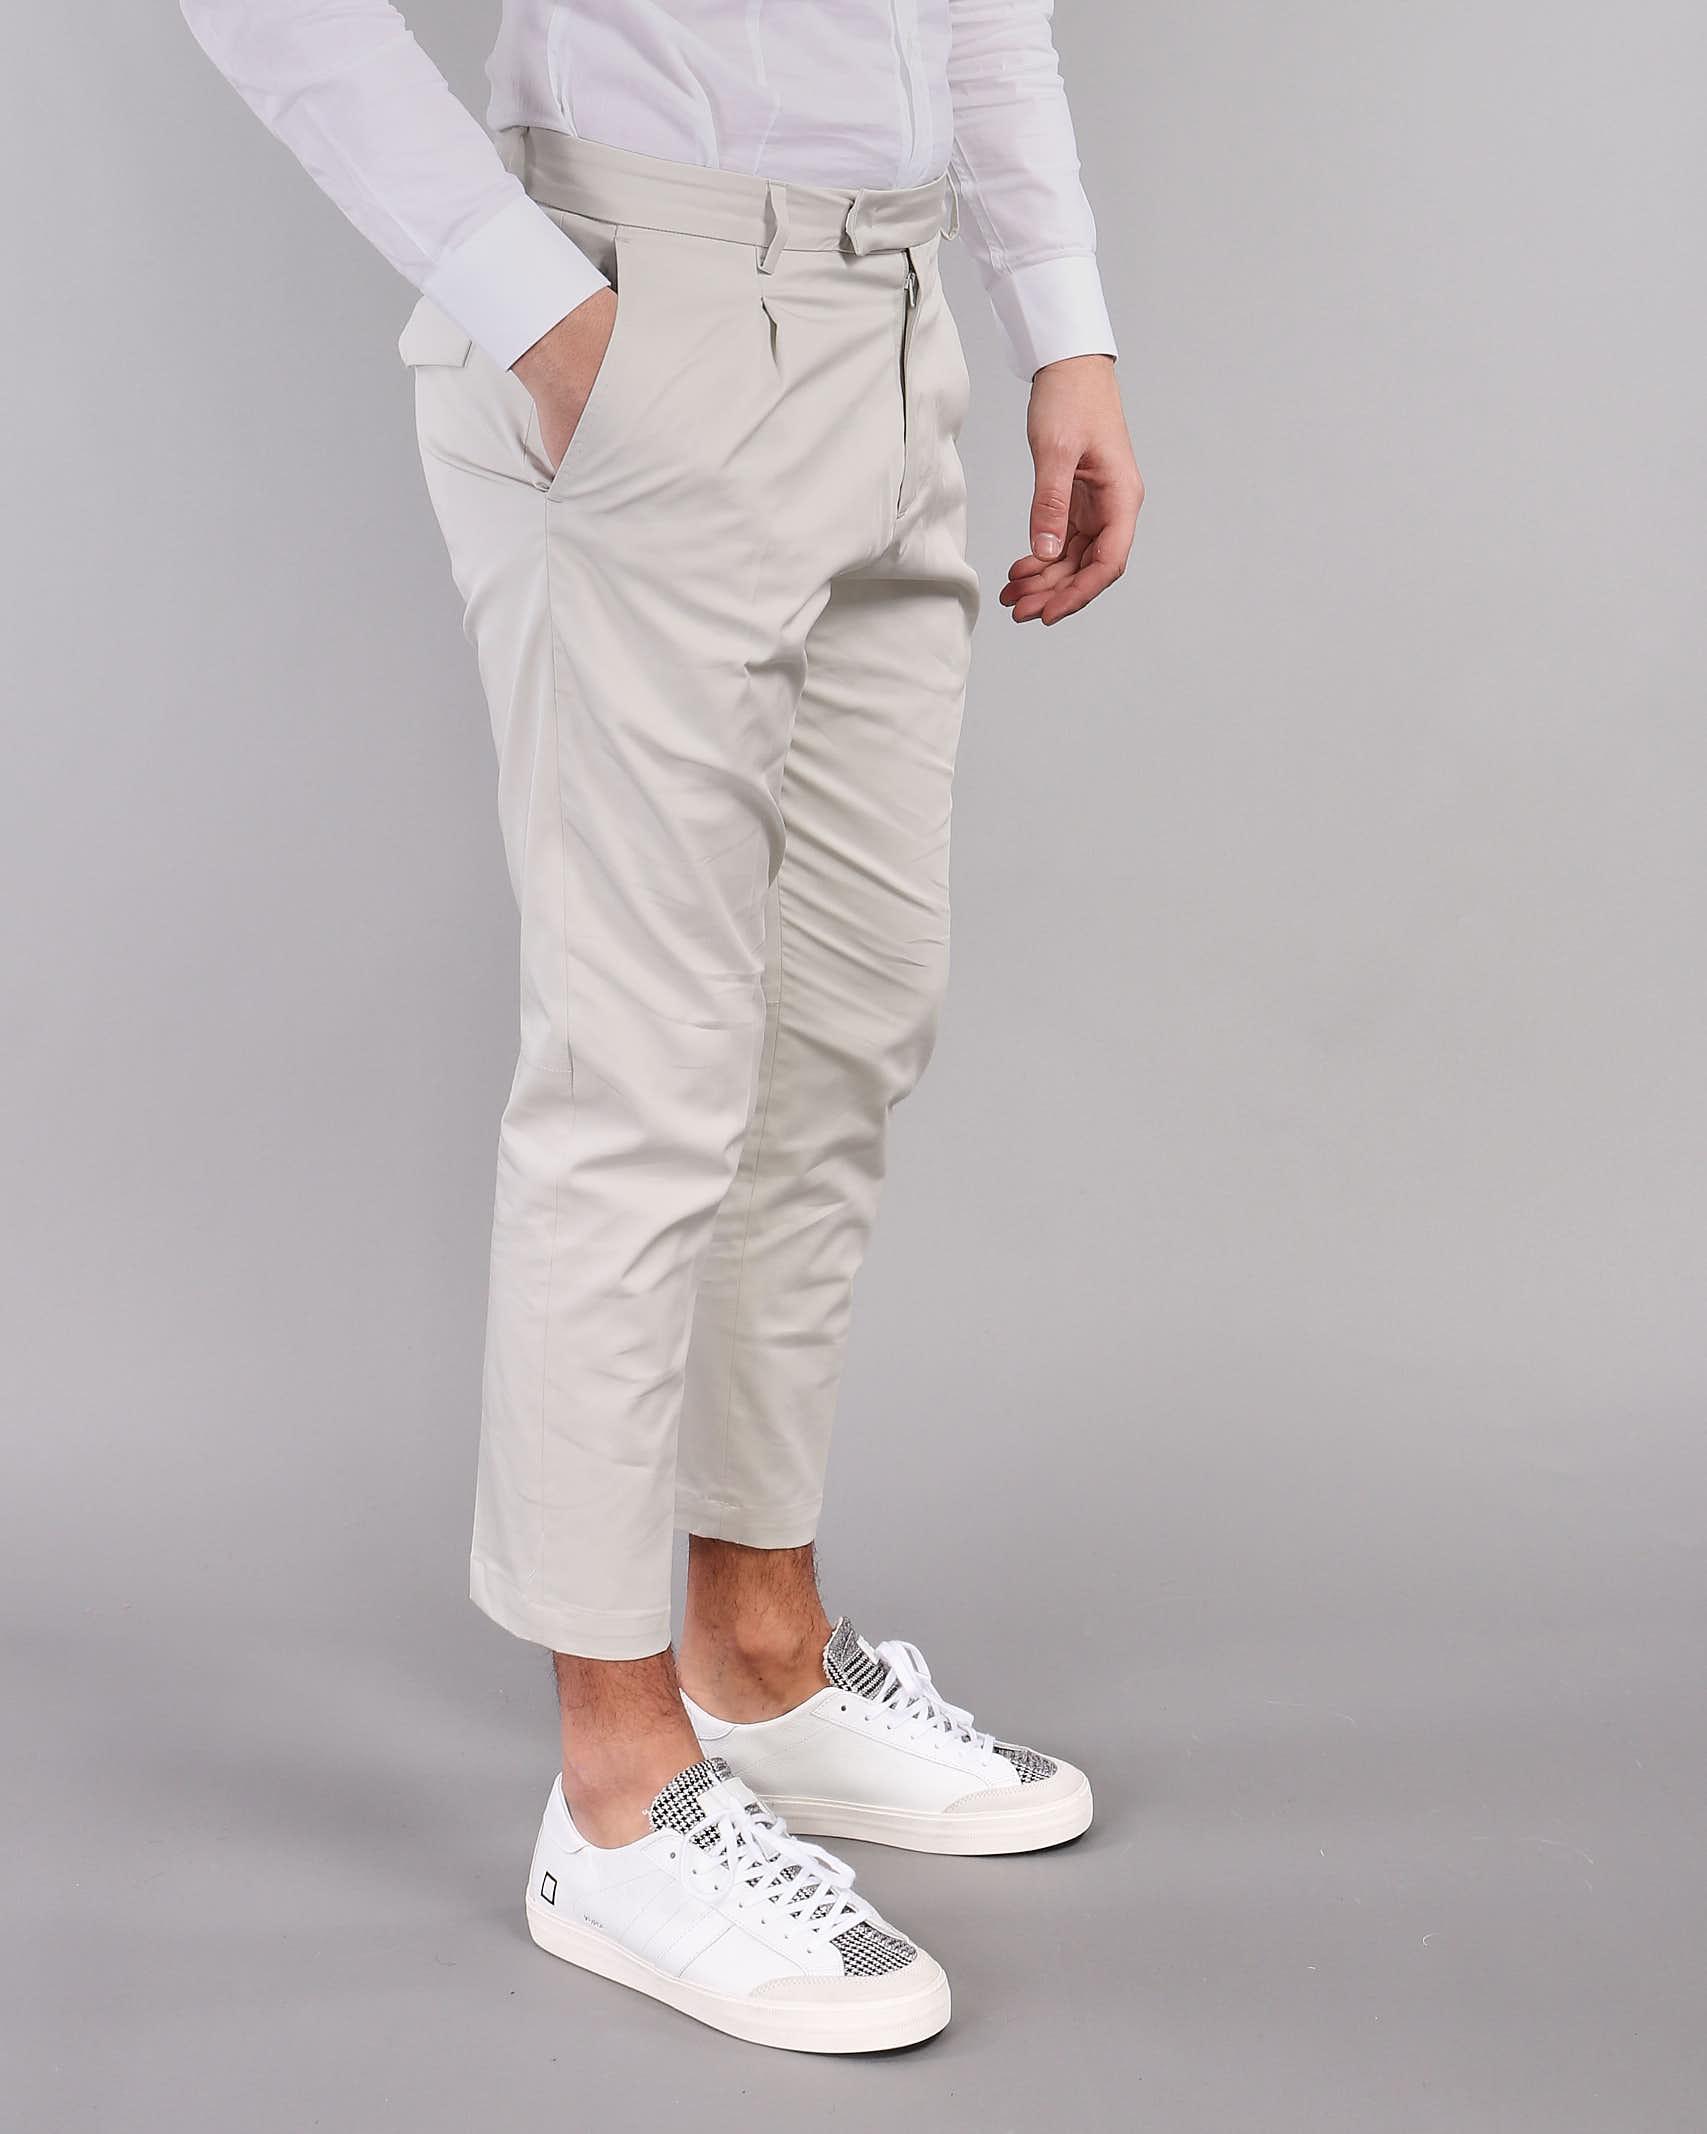 Pantalone in cotone con pences MC Low Brand LOW BRAND | Pantalone | L1PSS215693A031